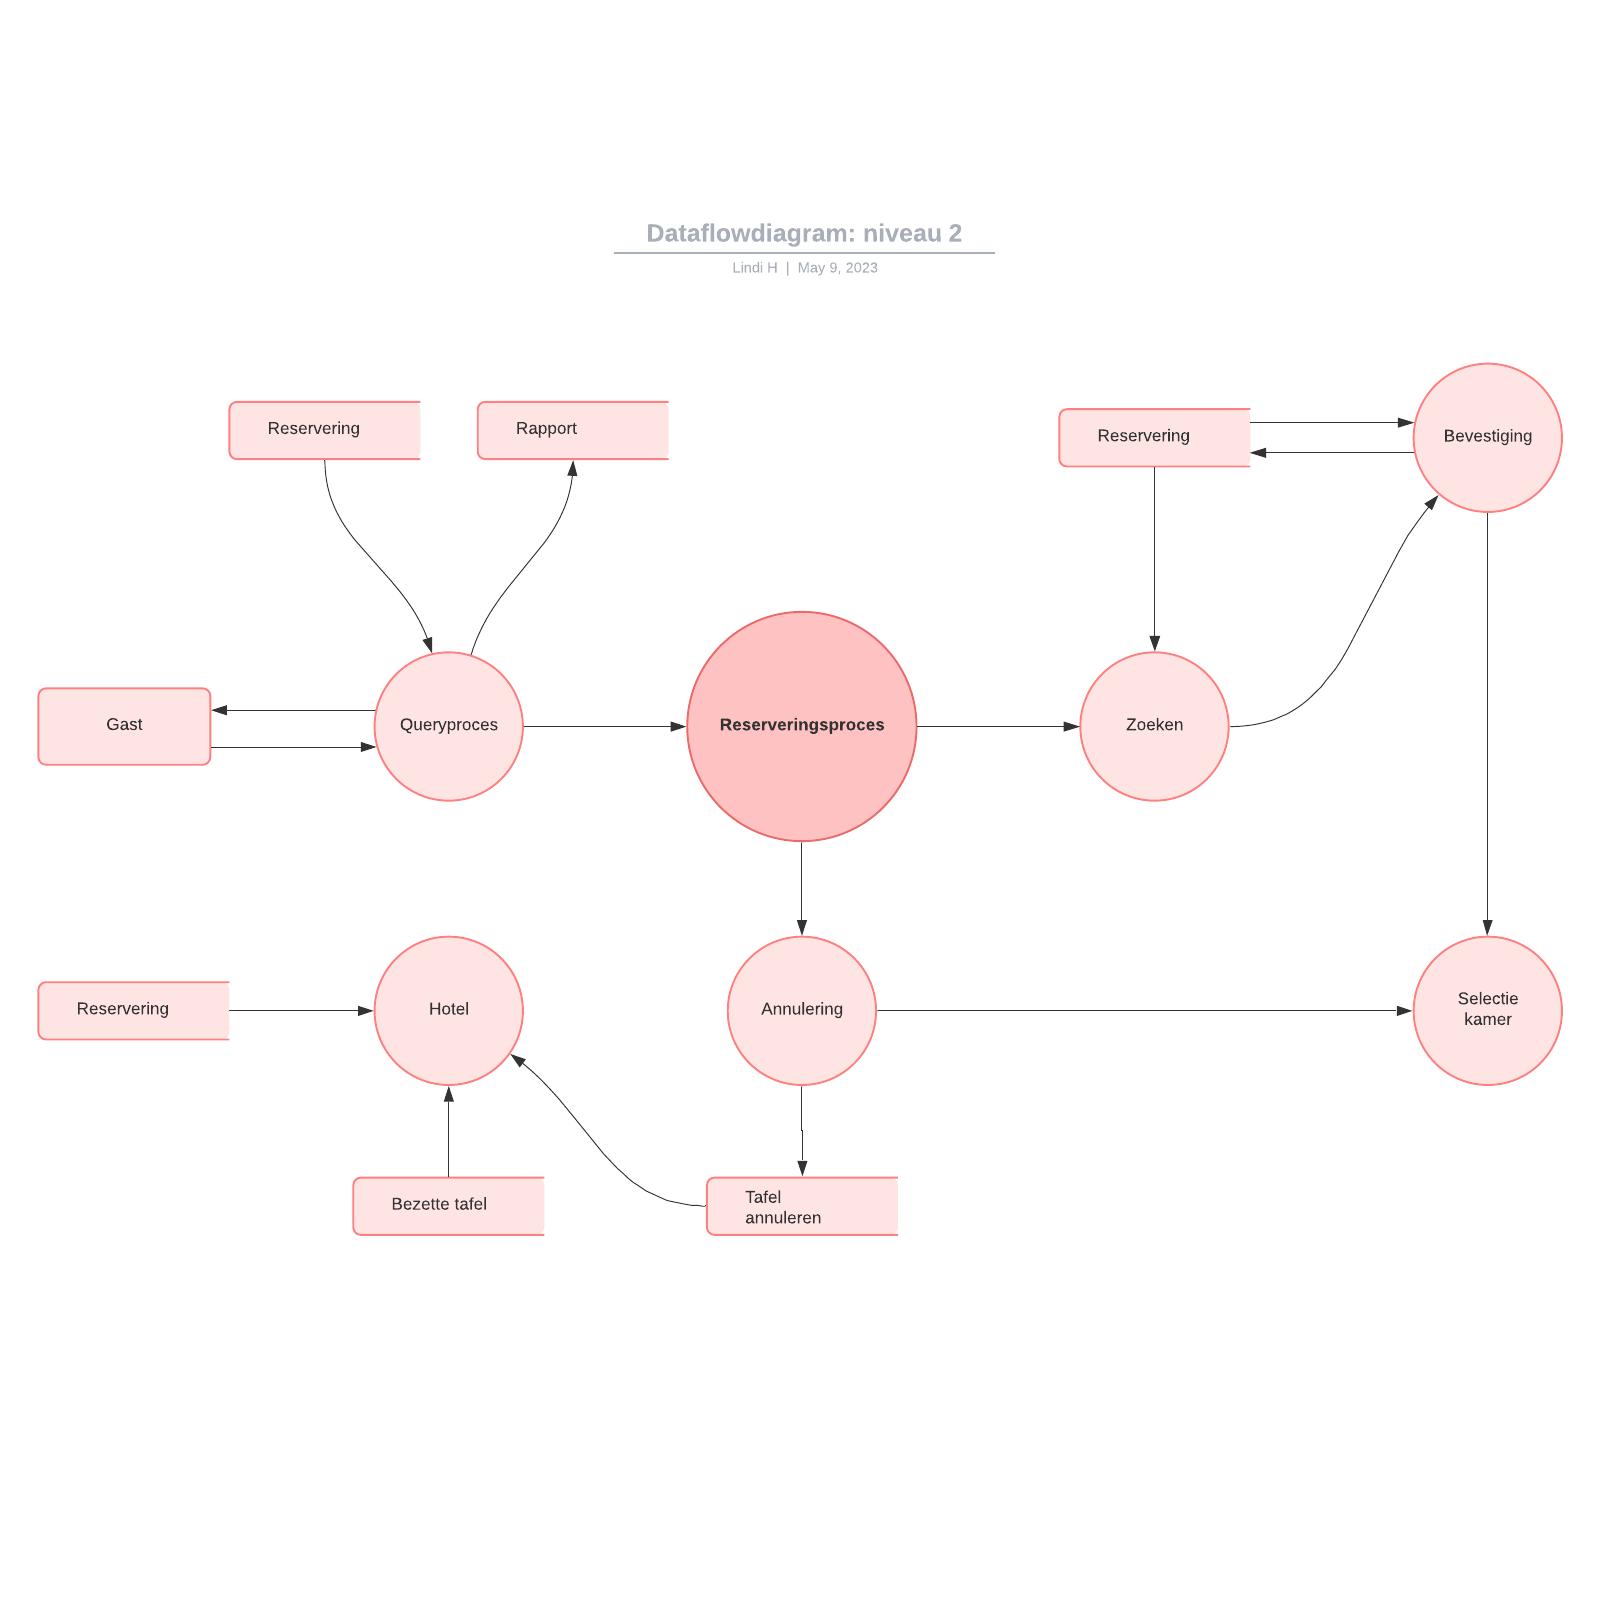 Dataflowdiagram: niveau 2